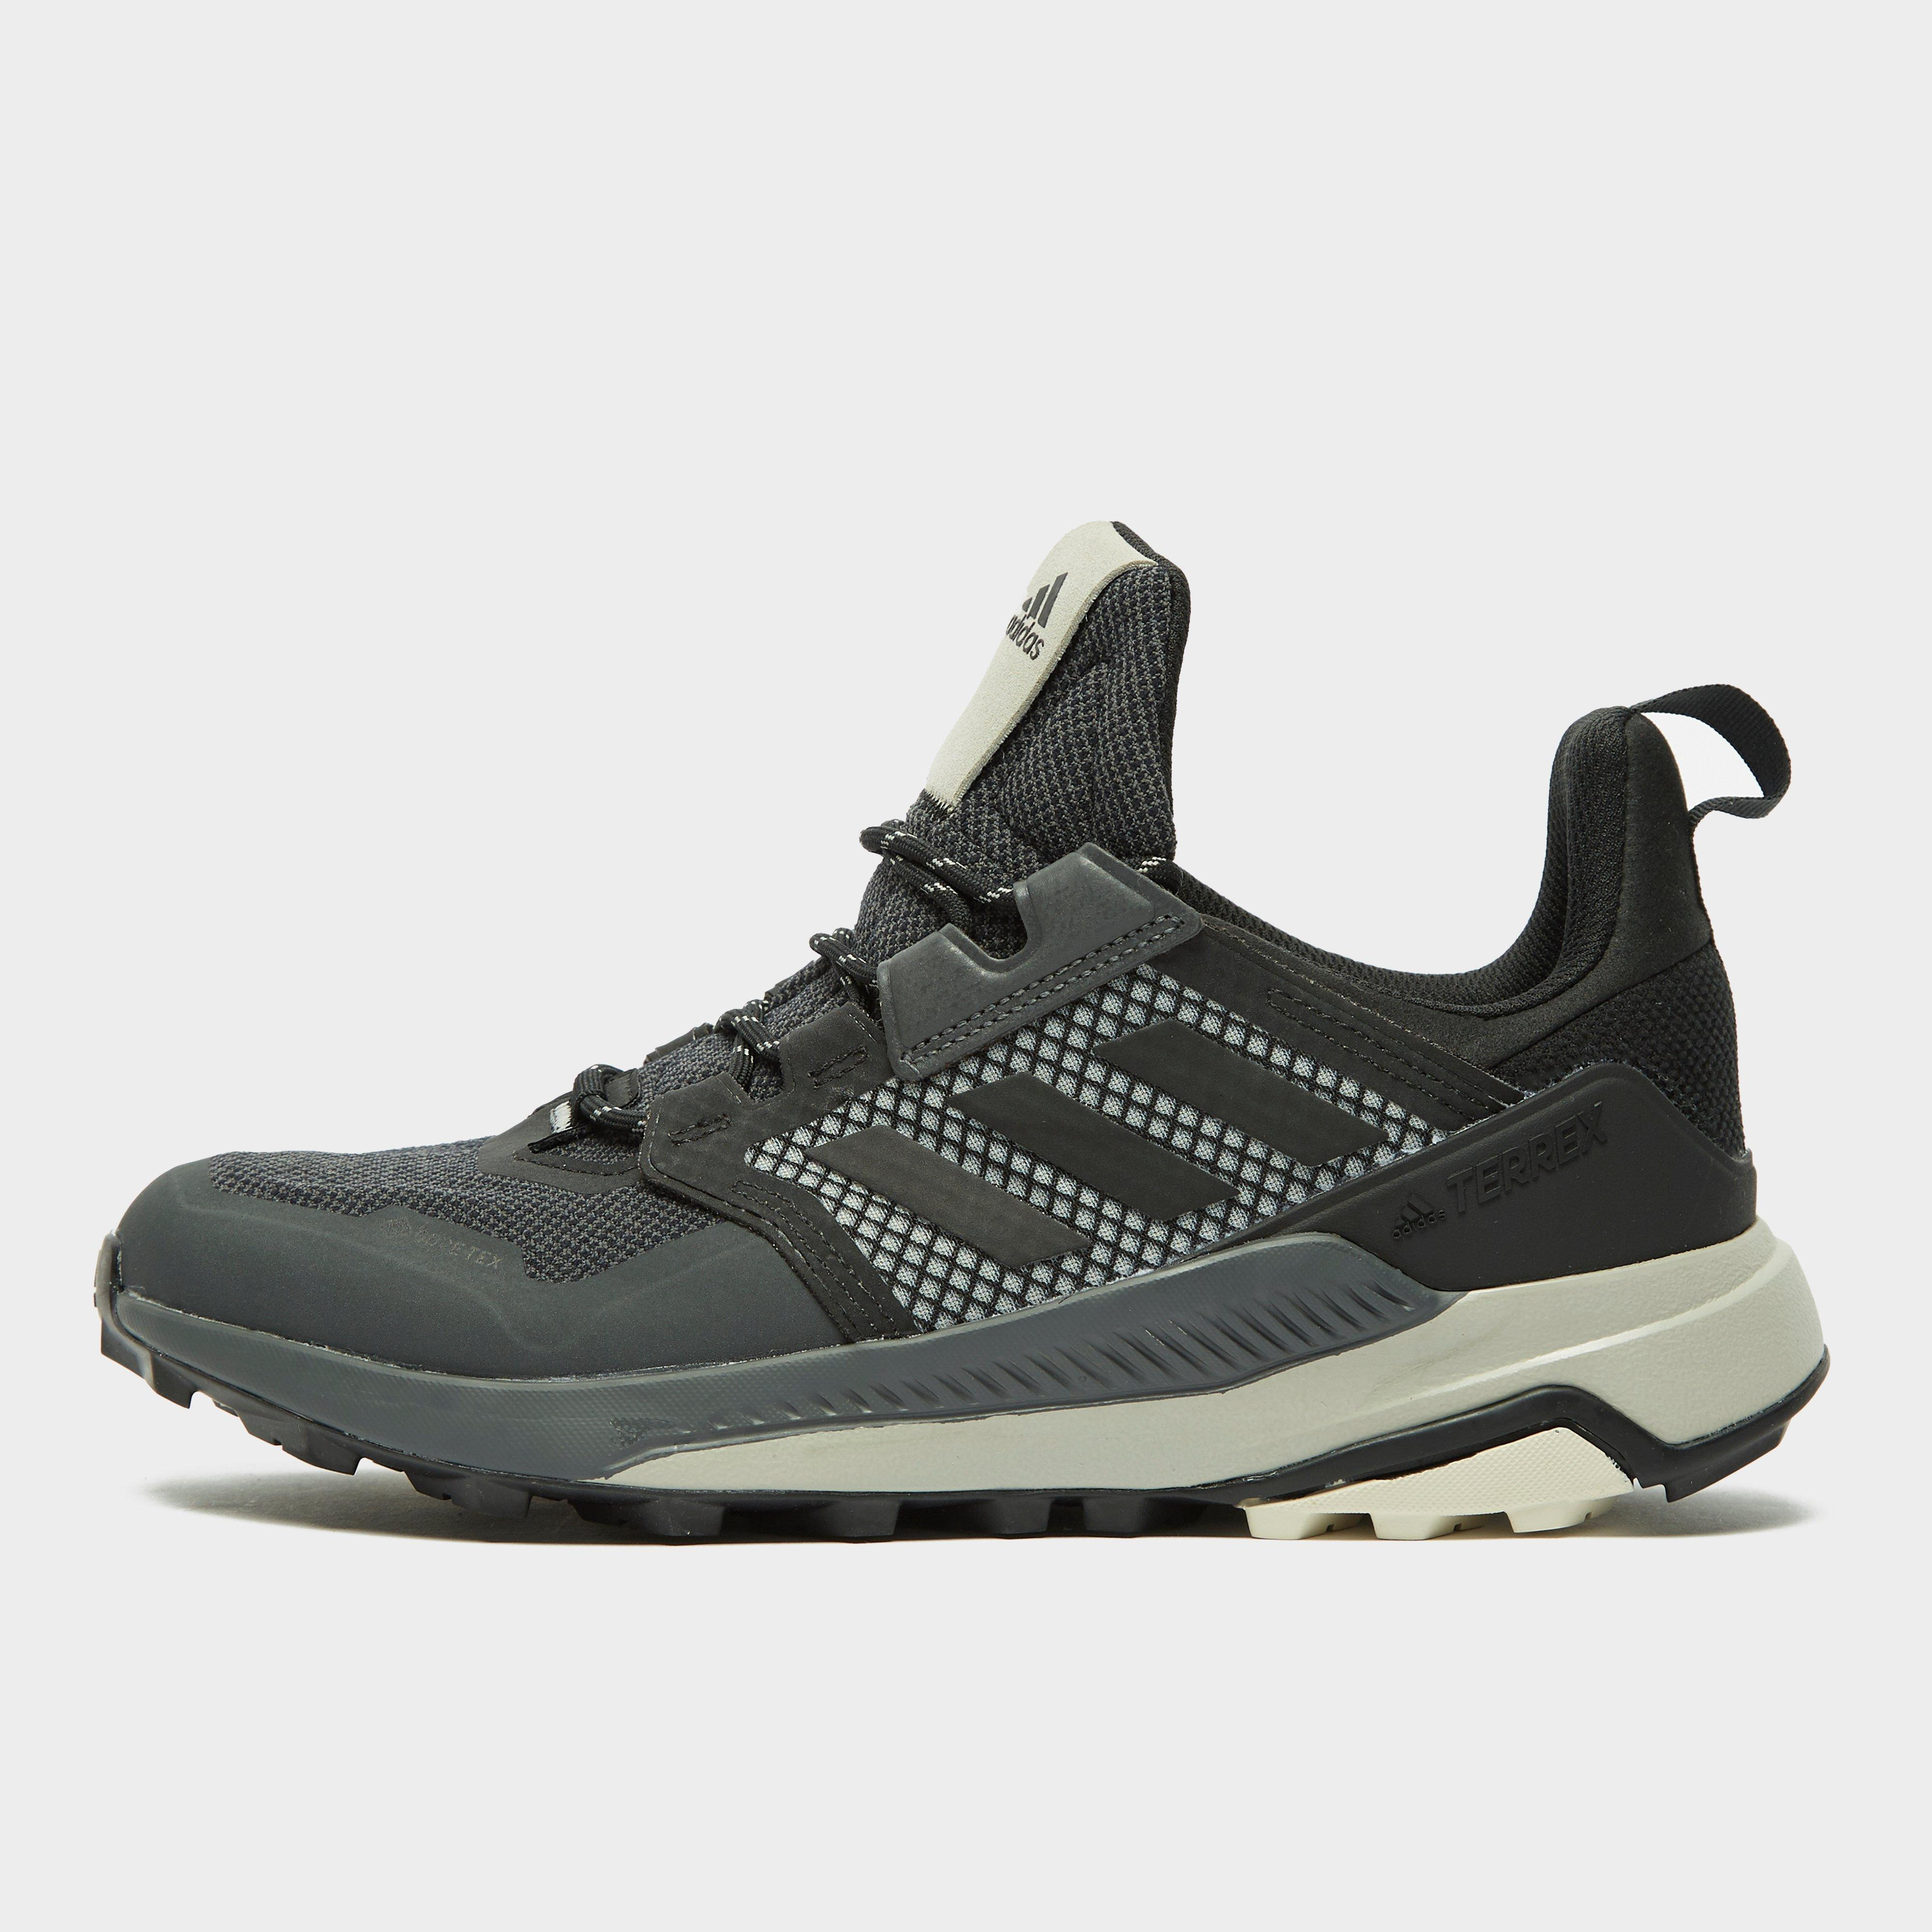 adidas terrex goretex shoes men